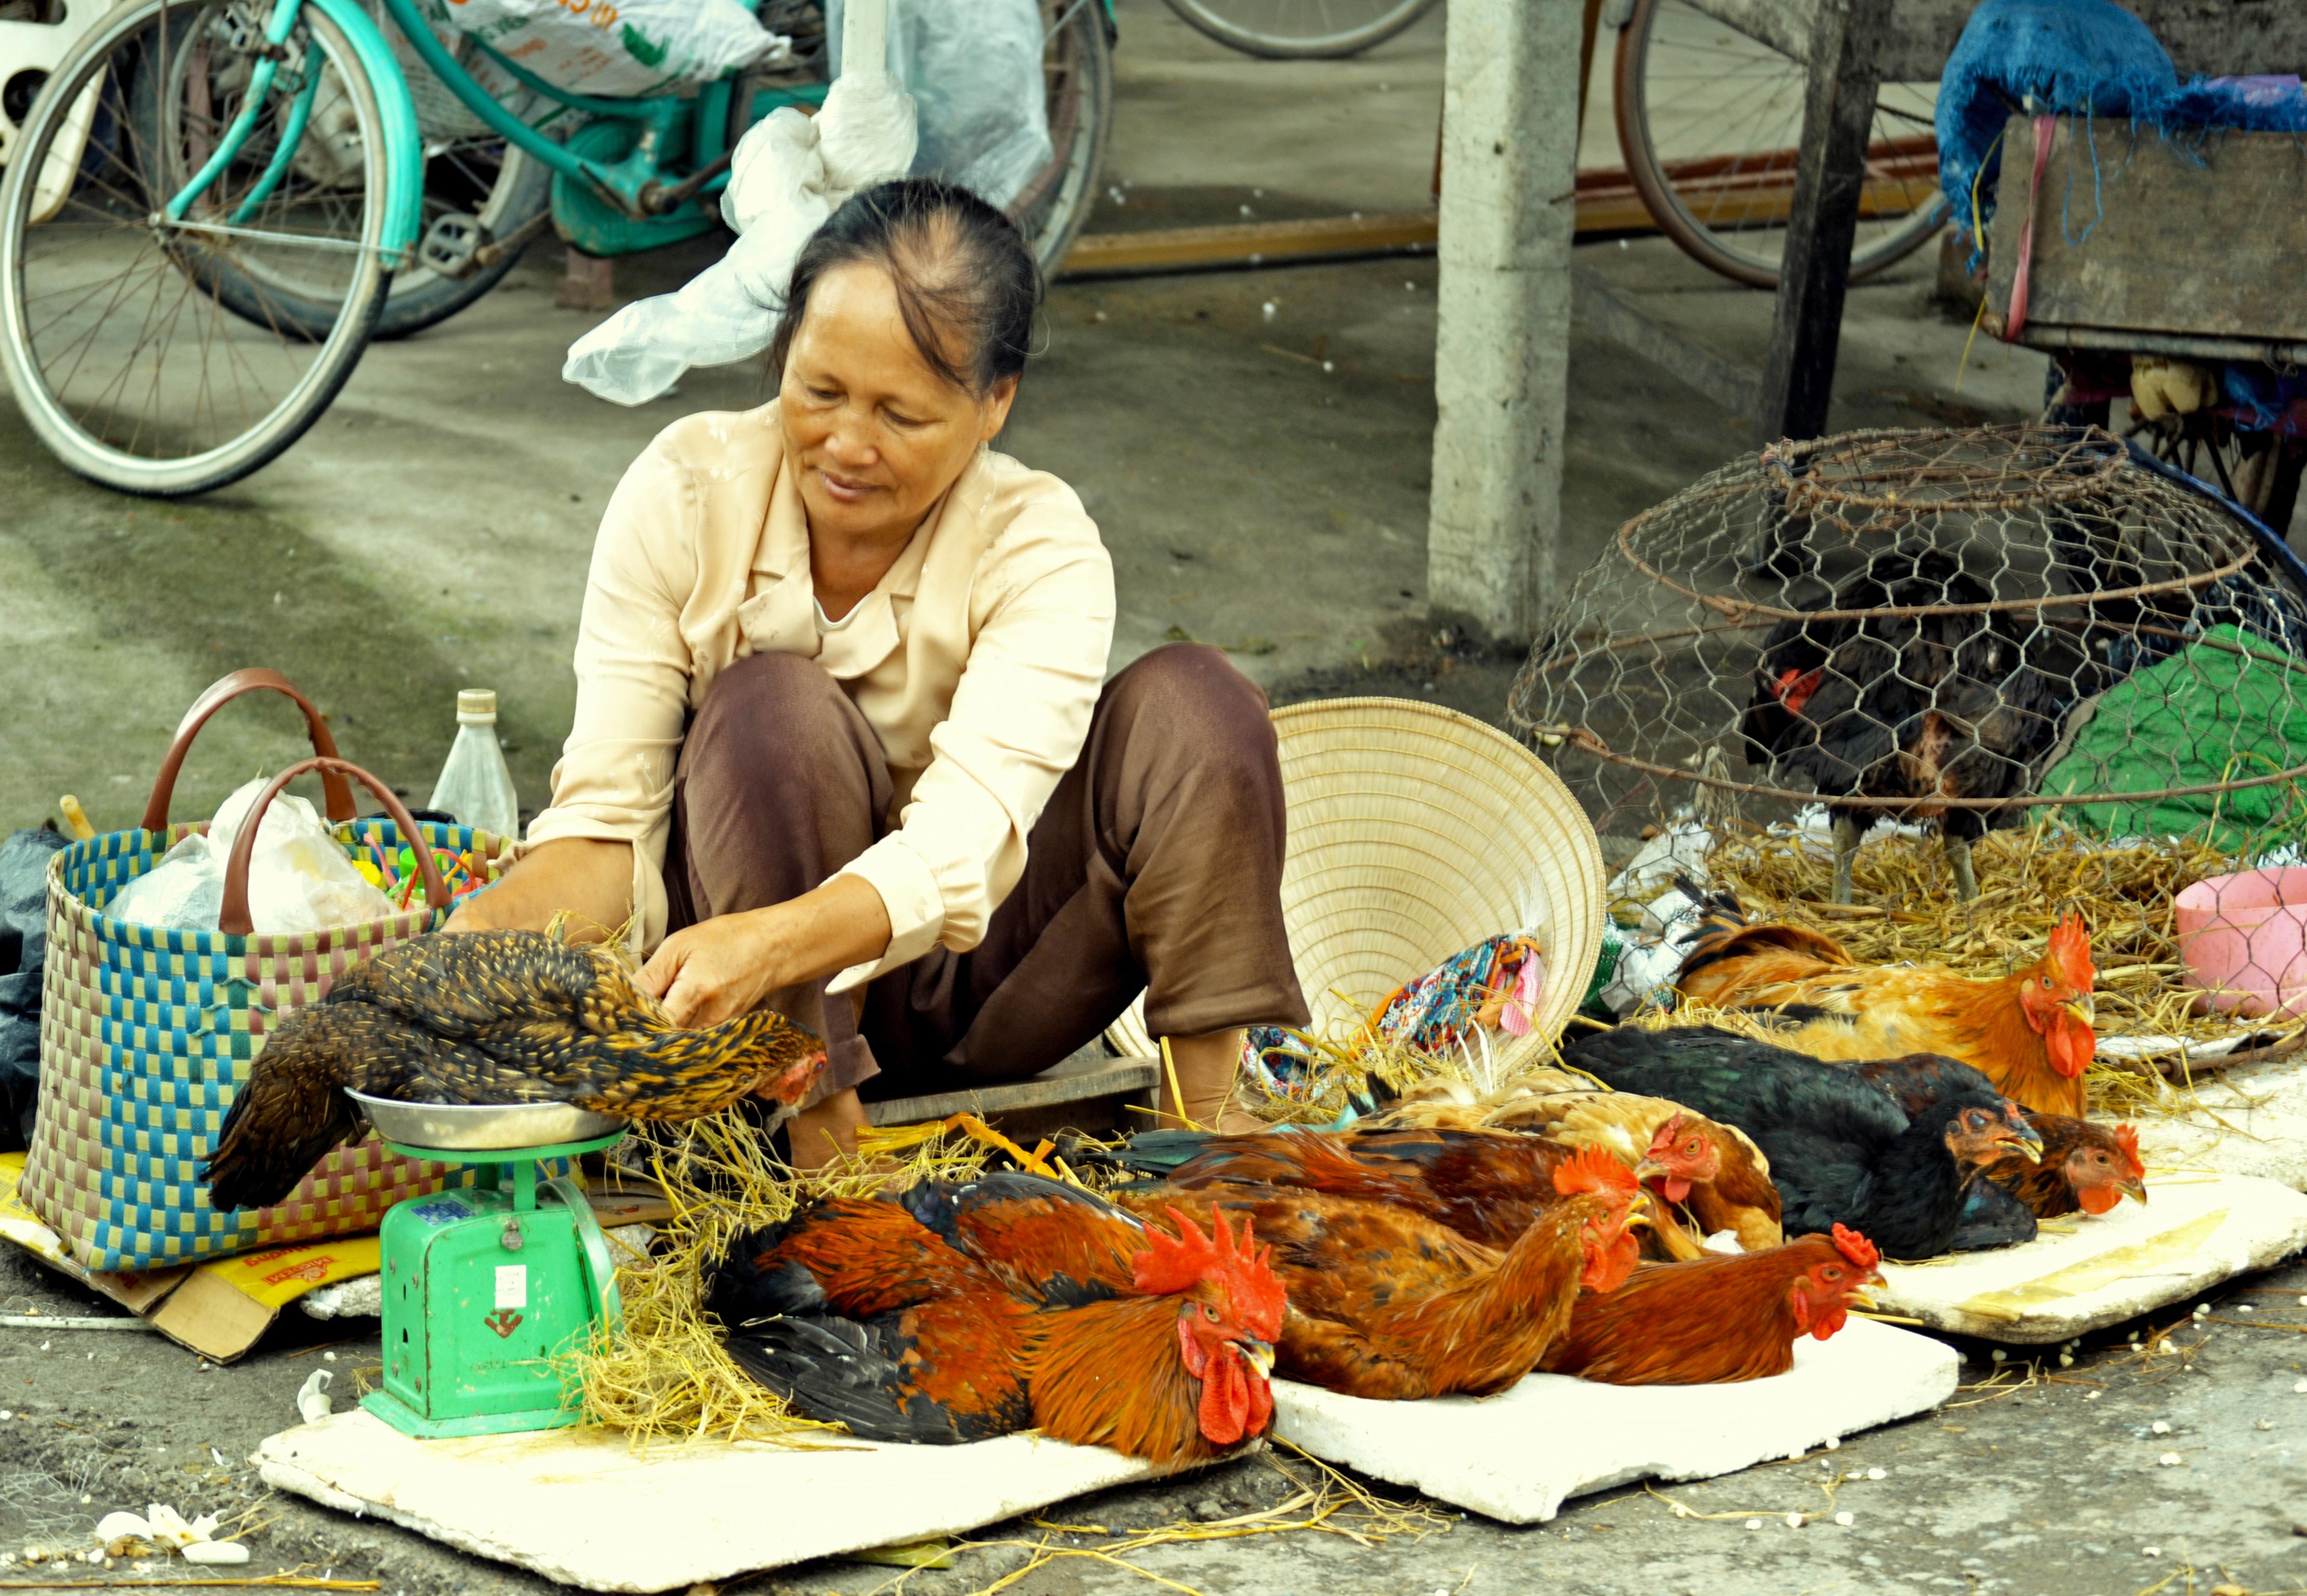 A live chicken vendor weighs a chicken in Hung Yen province, Vietnam (photo credit: ILRI/Nguyen Ngoc Huyen).